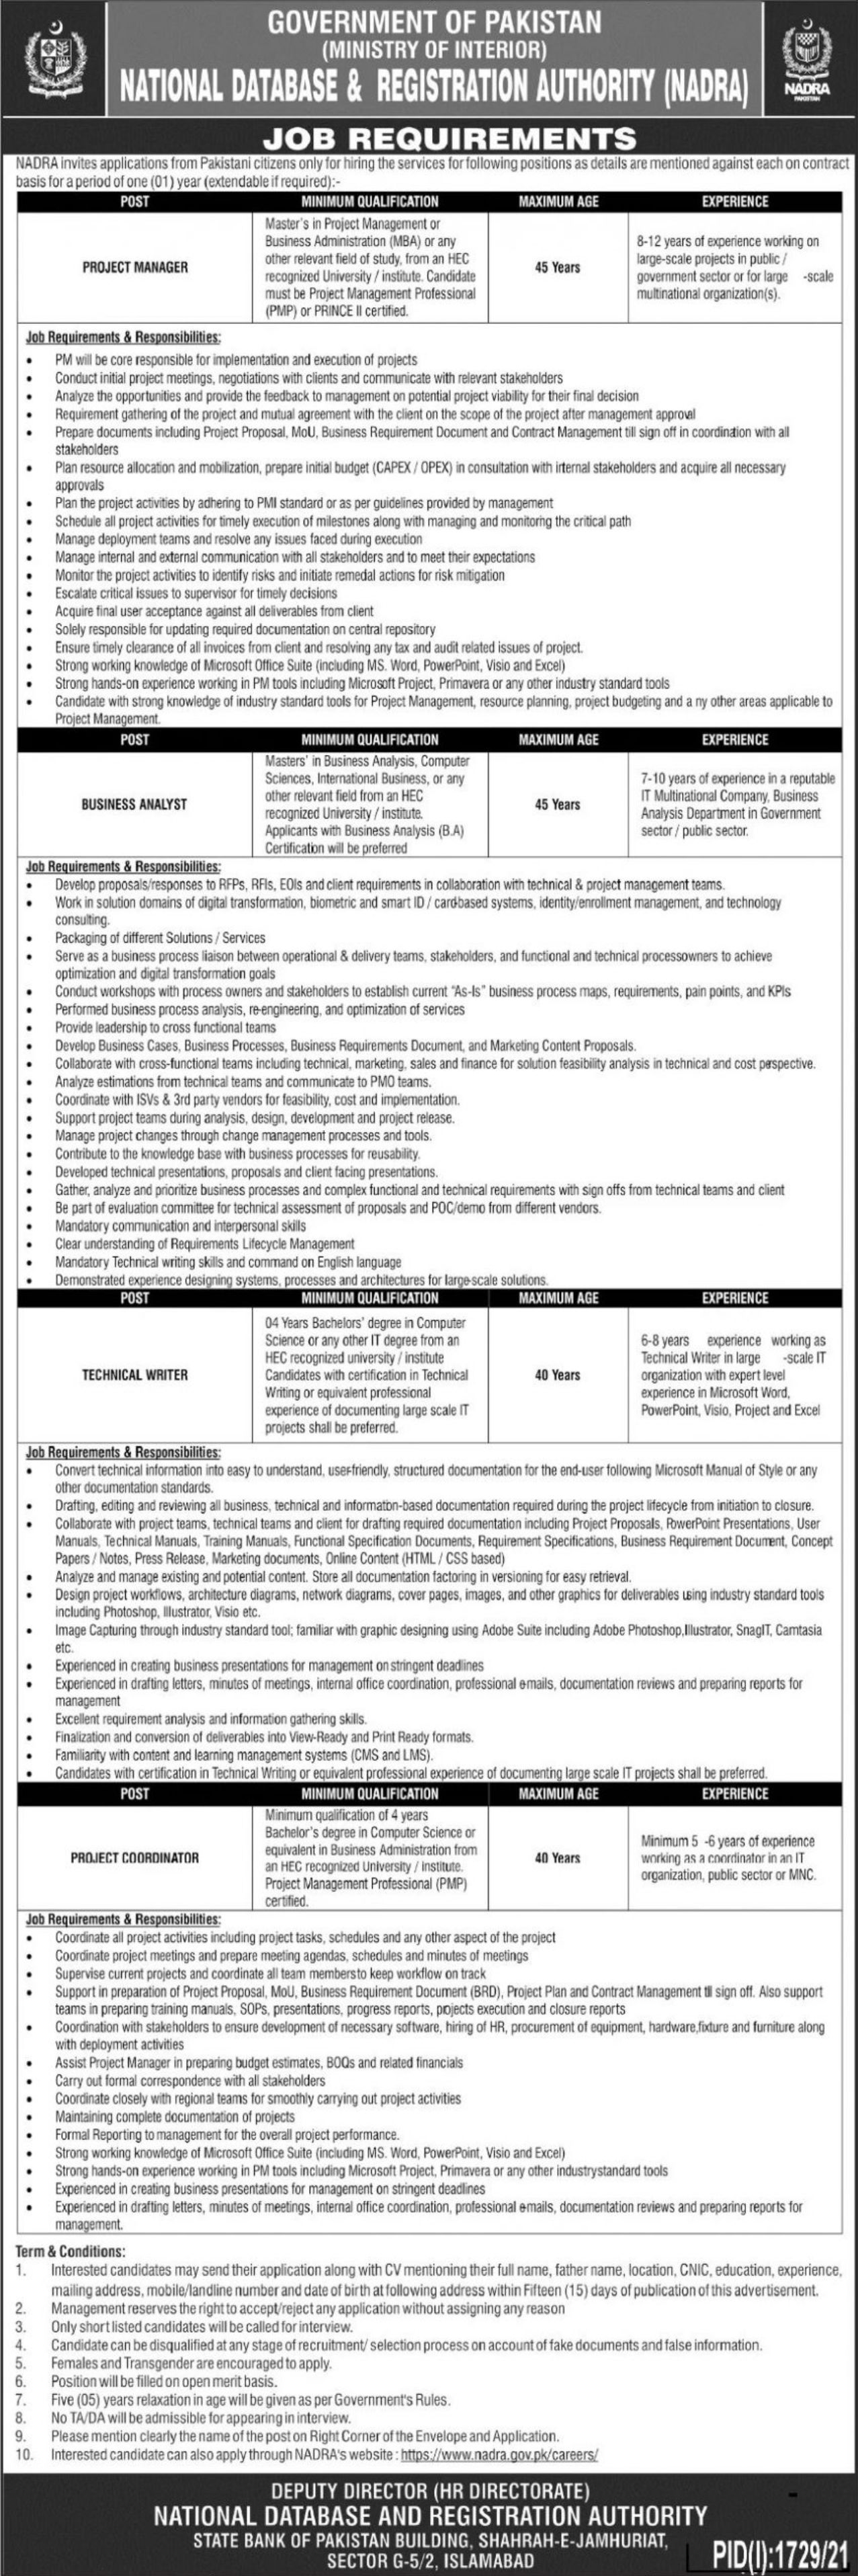 National Database & Registration Authority NADRA Vacancies 2021 – Dailyjobs.pk 3